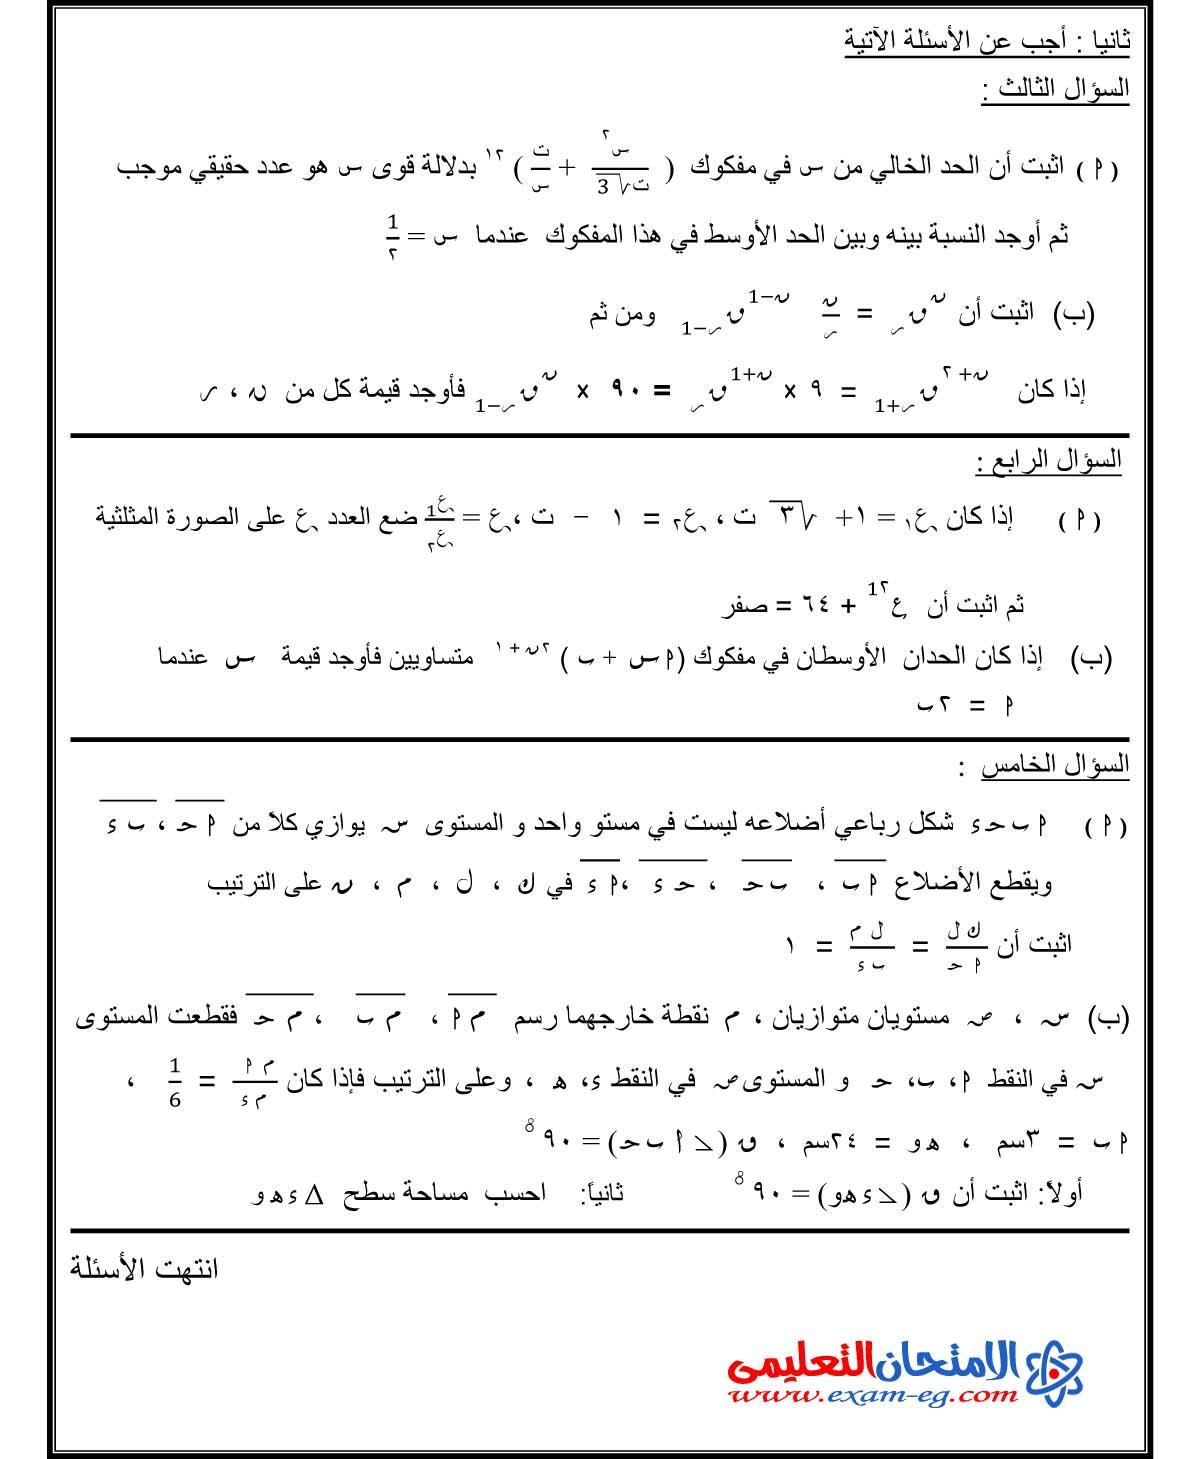 exam-eg.com_1460421183024.jpg